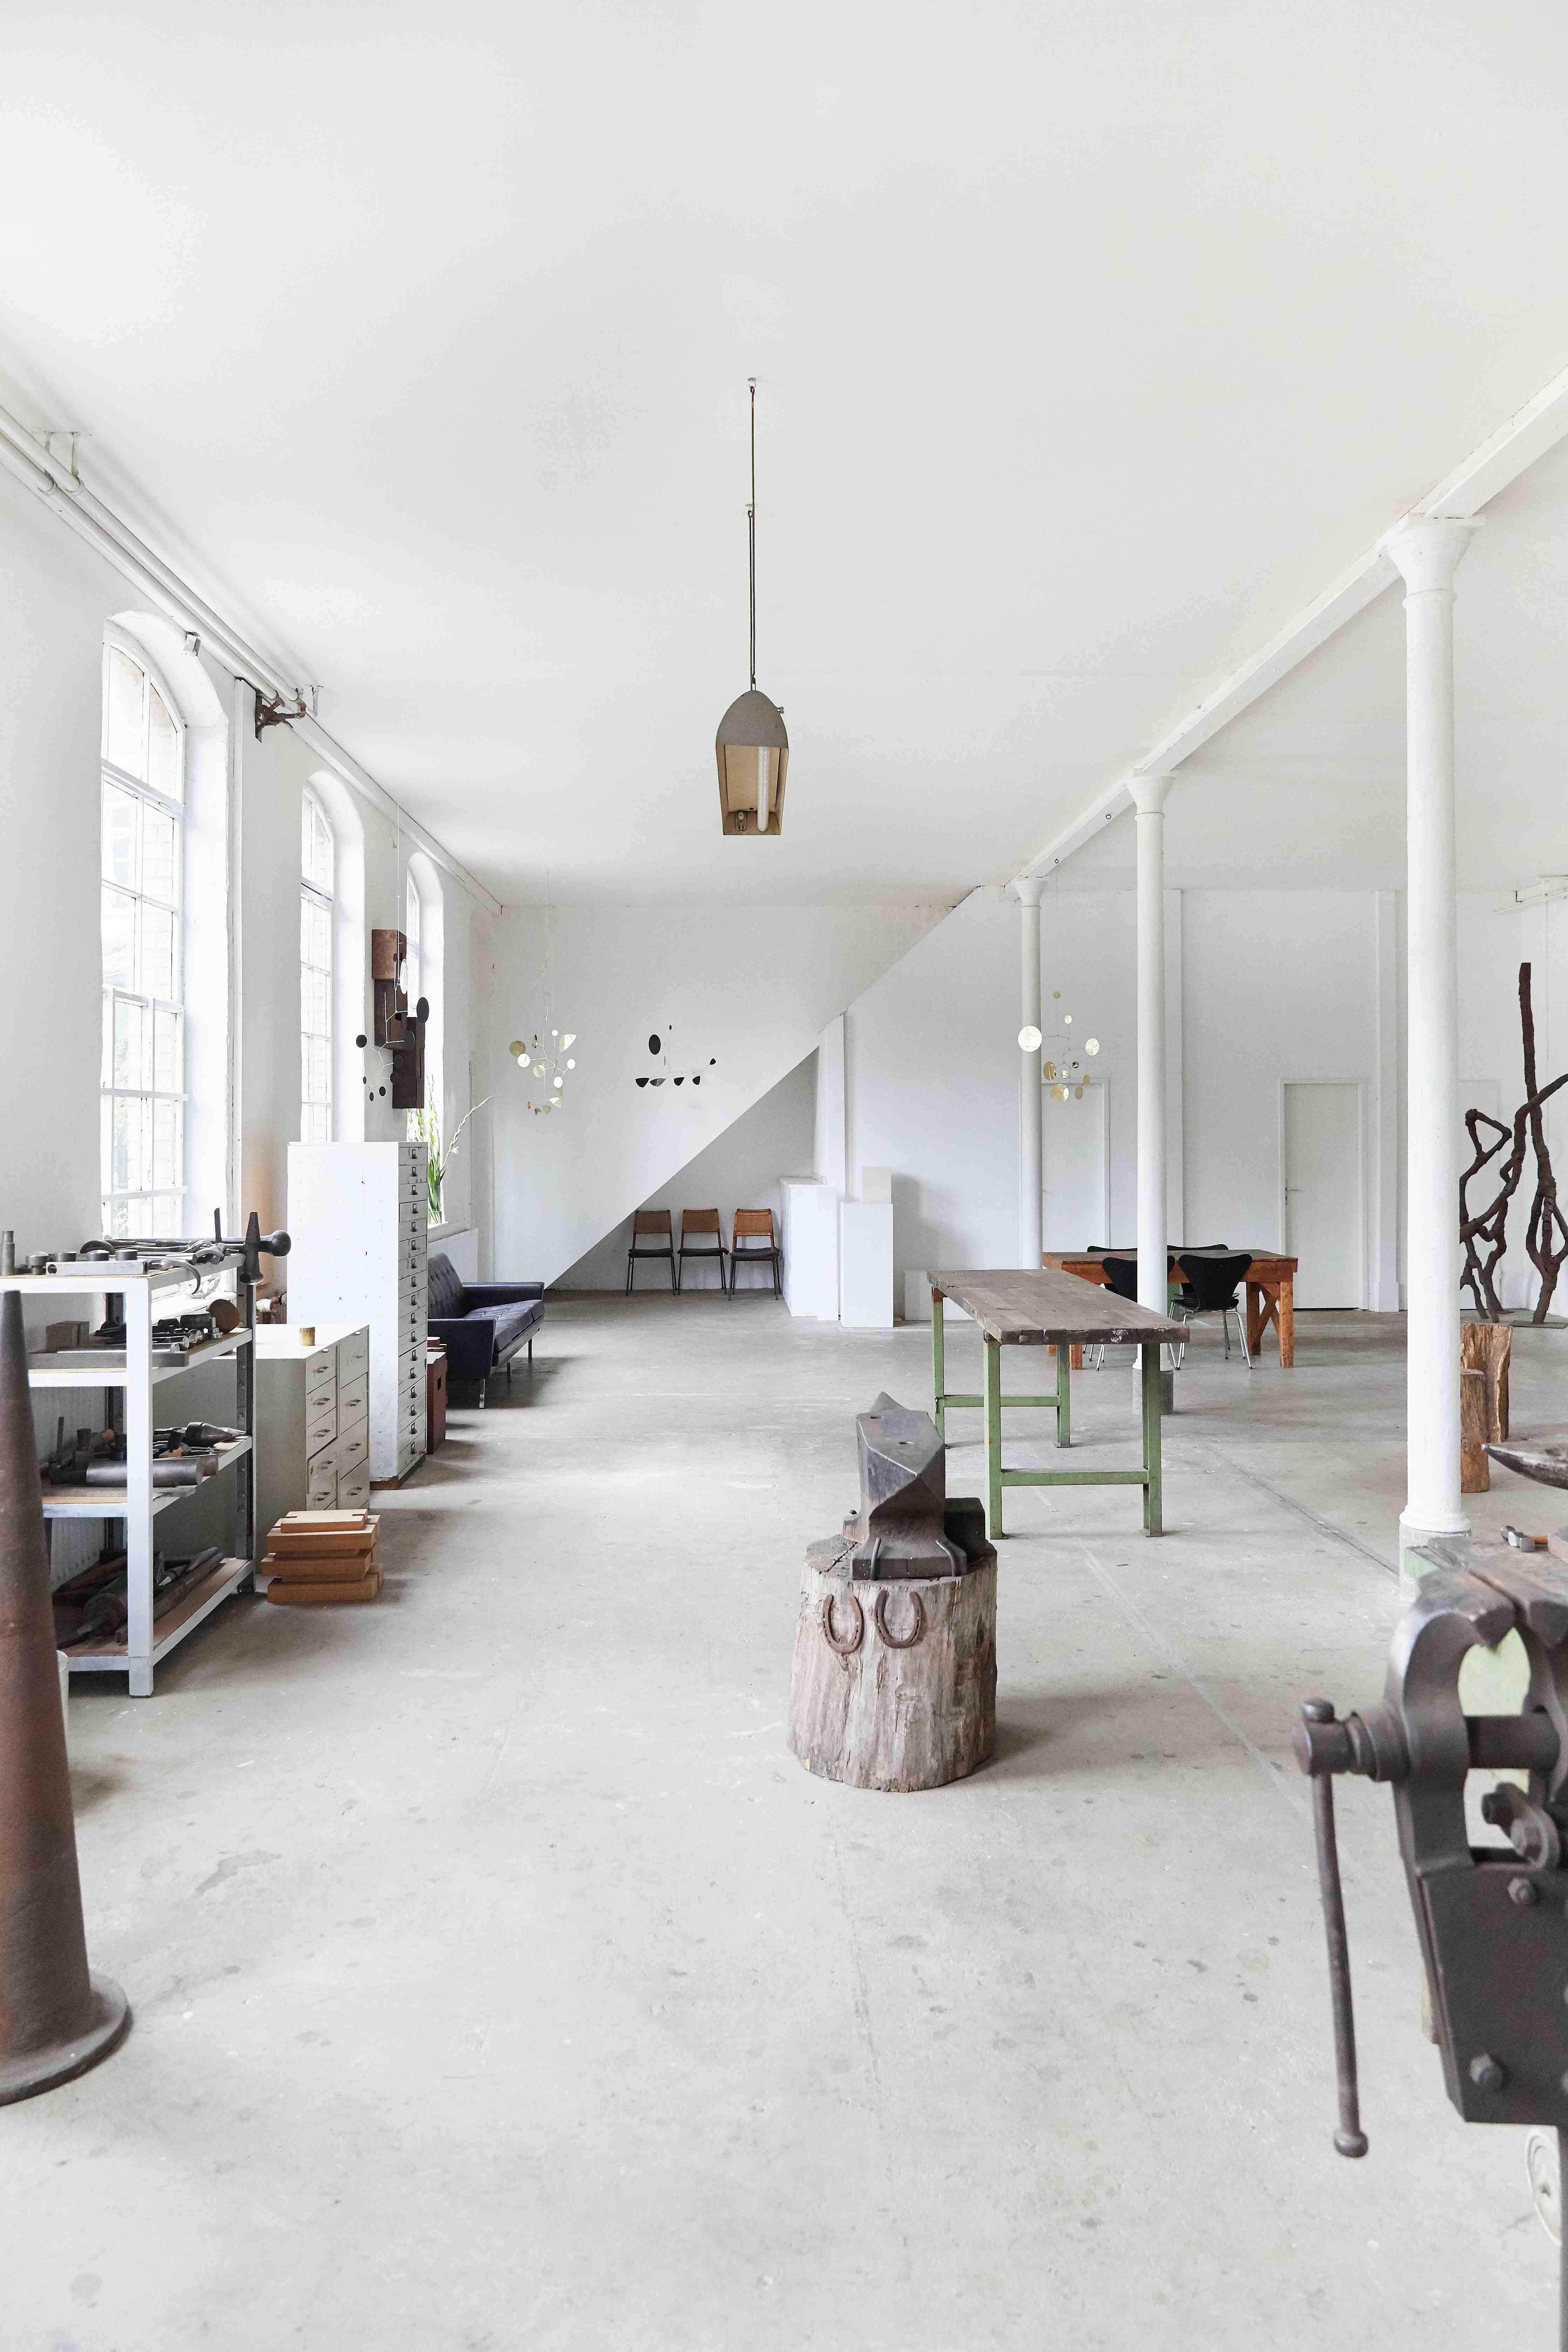 Lappalainen Atelier. Home Of Wilfrid Kreutz + Rivka Baake